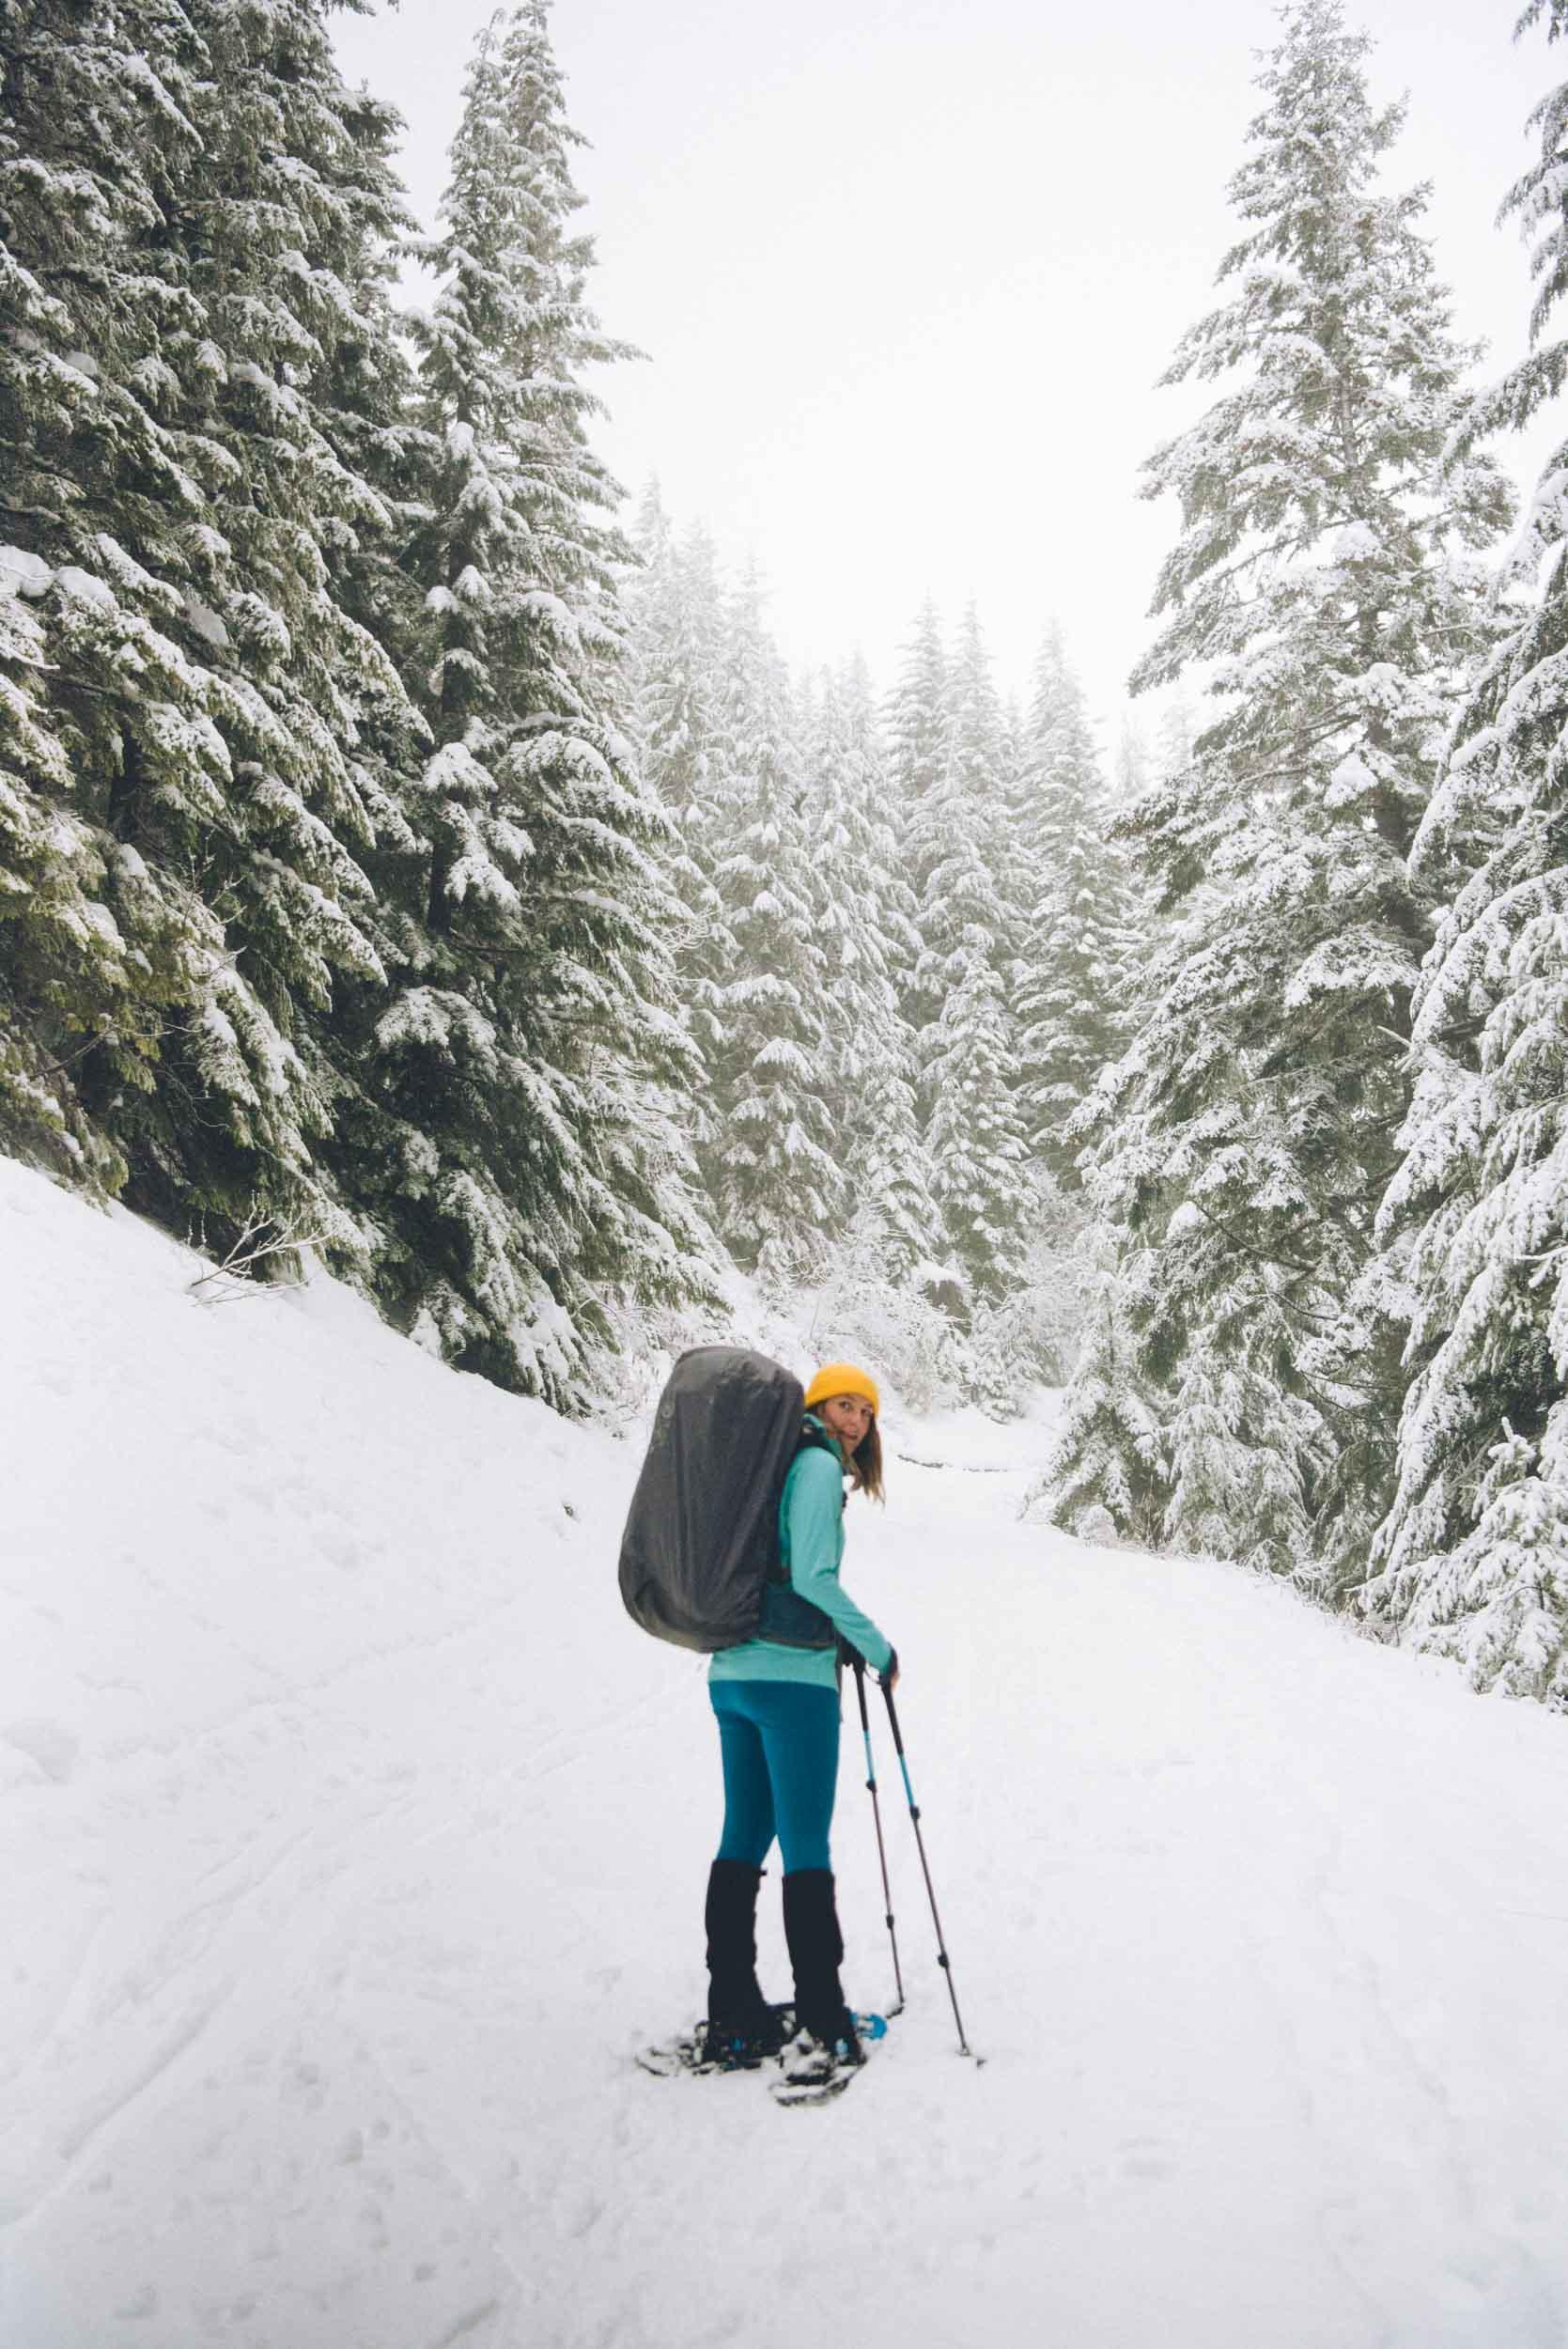 Miriam-Subbiah-Snow-Bowl-Hut-6.jpg